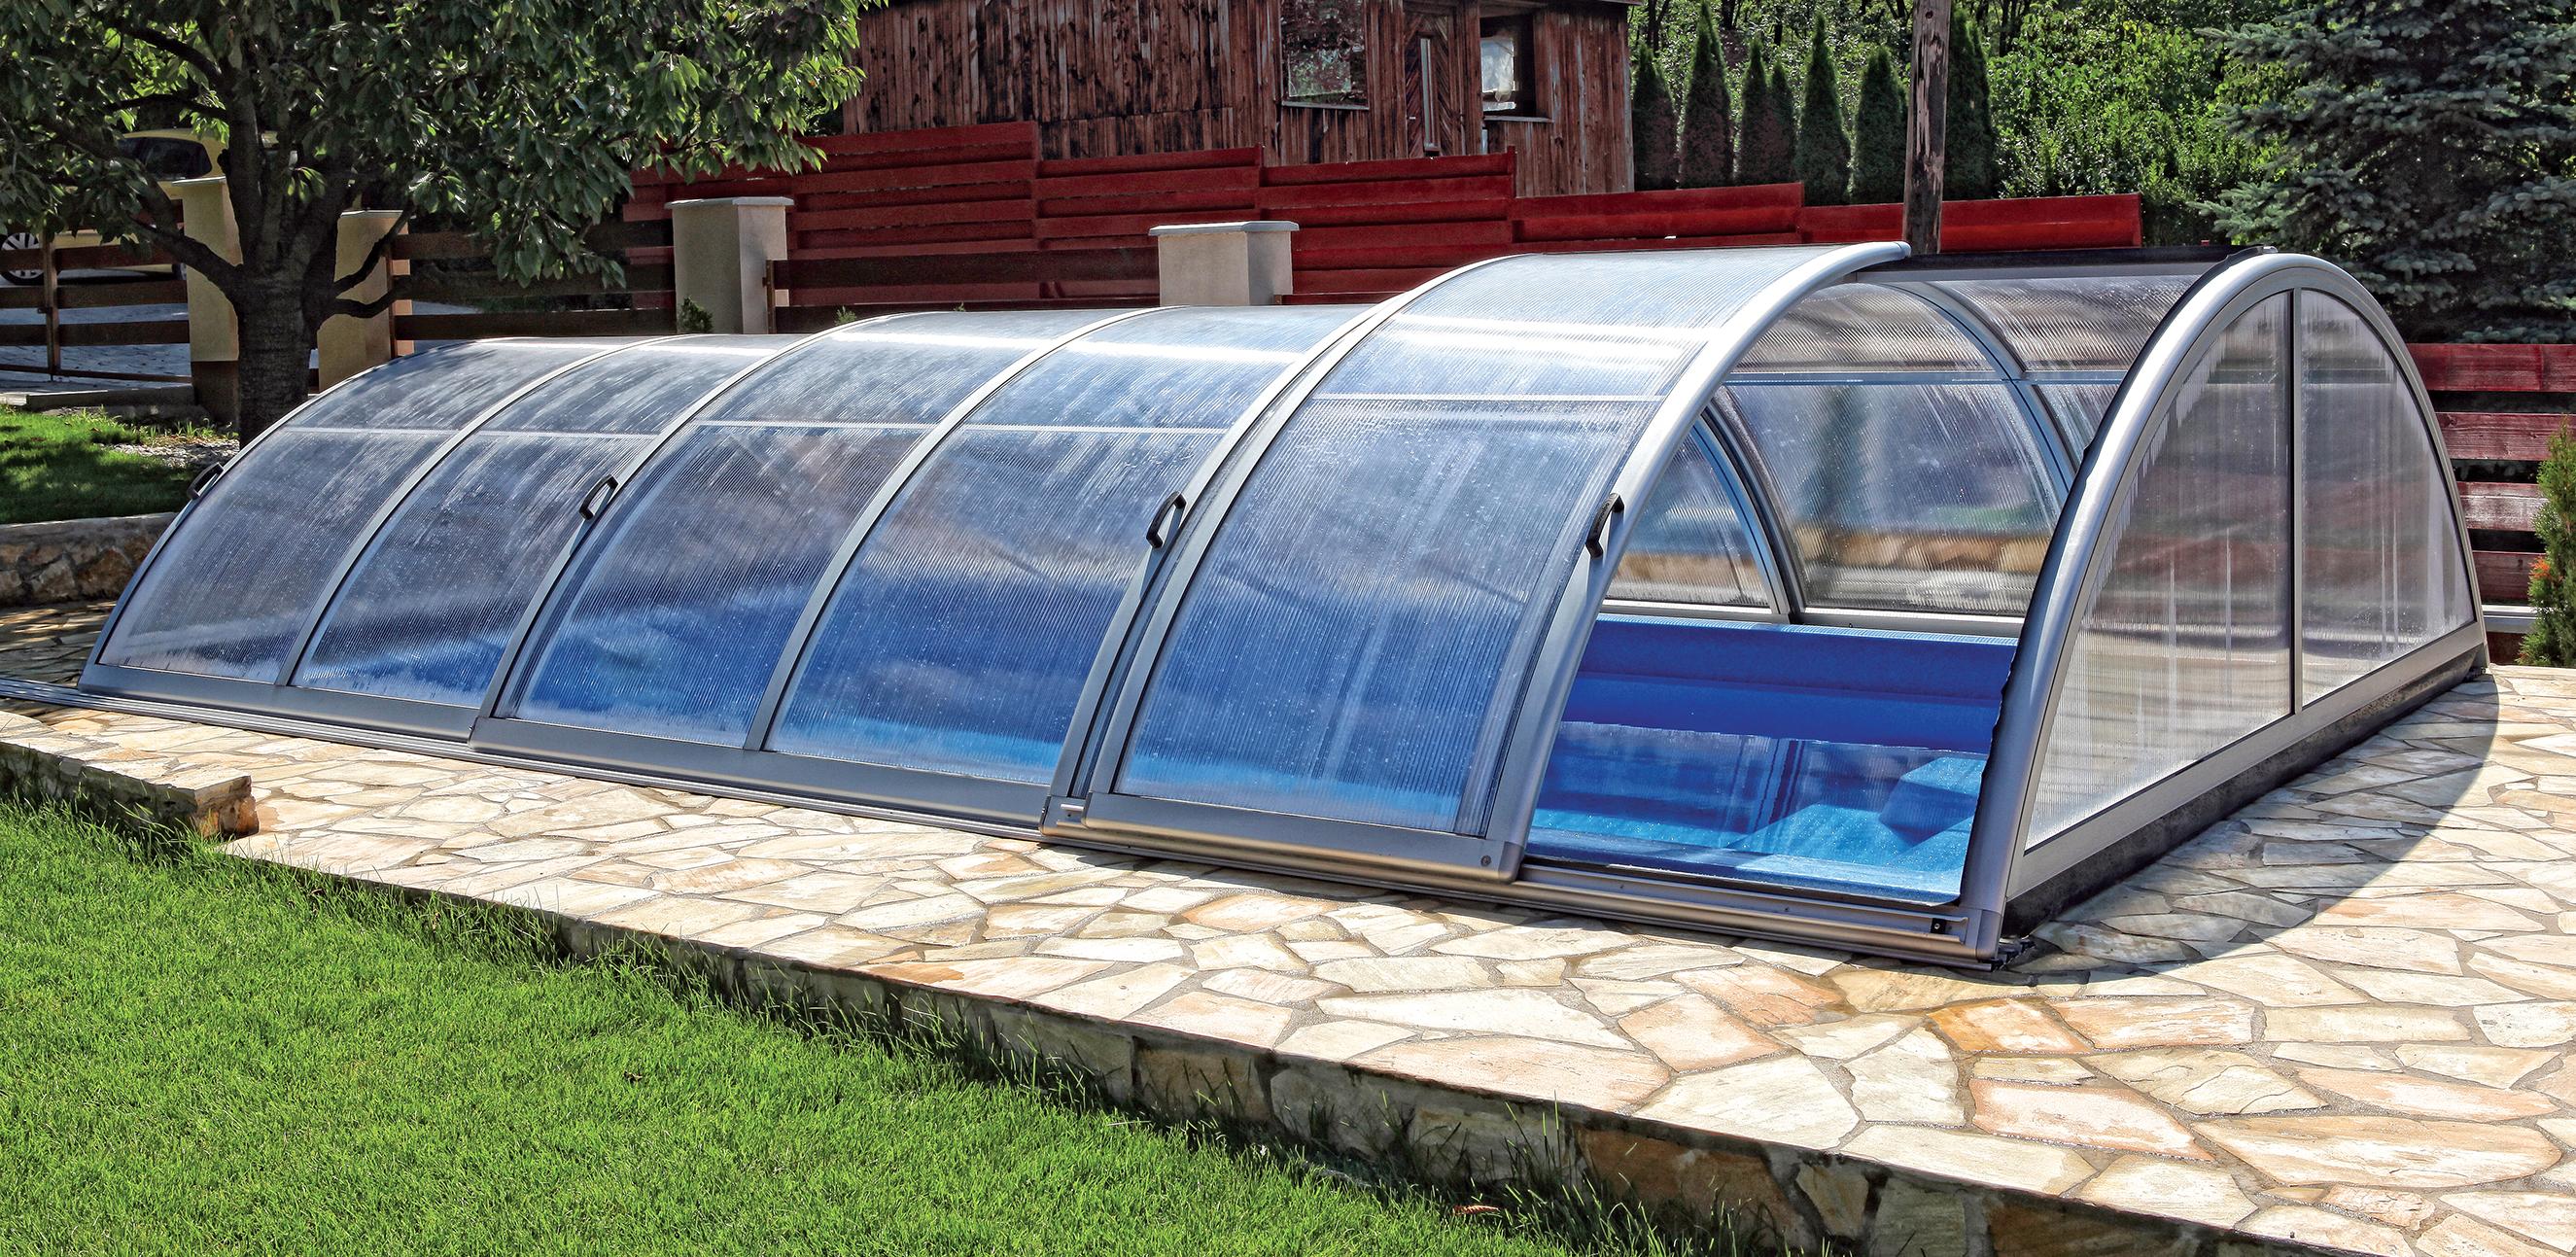 pool berdachungen schwimmbad berdachung ohne schienen. Black Bedroom Furniture Sets. Home Design Ideas